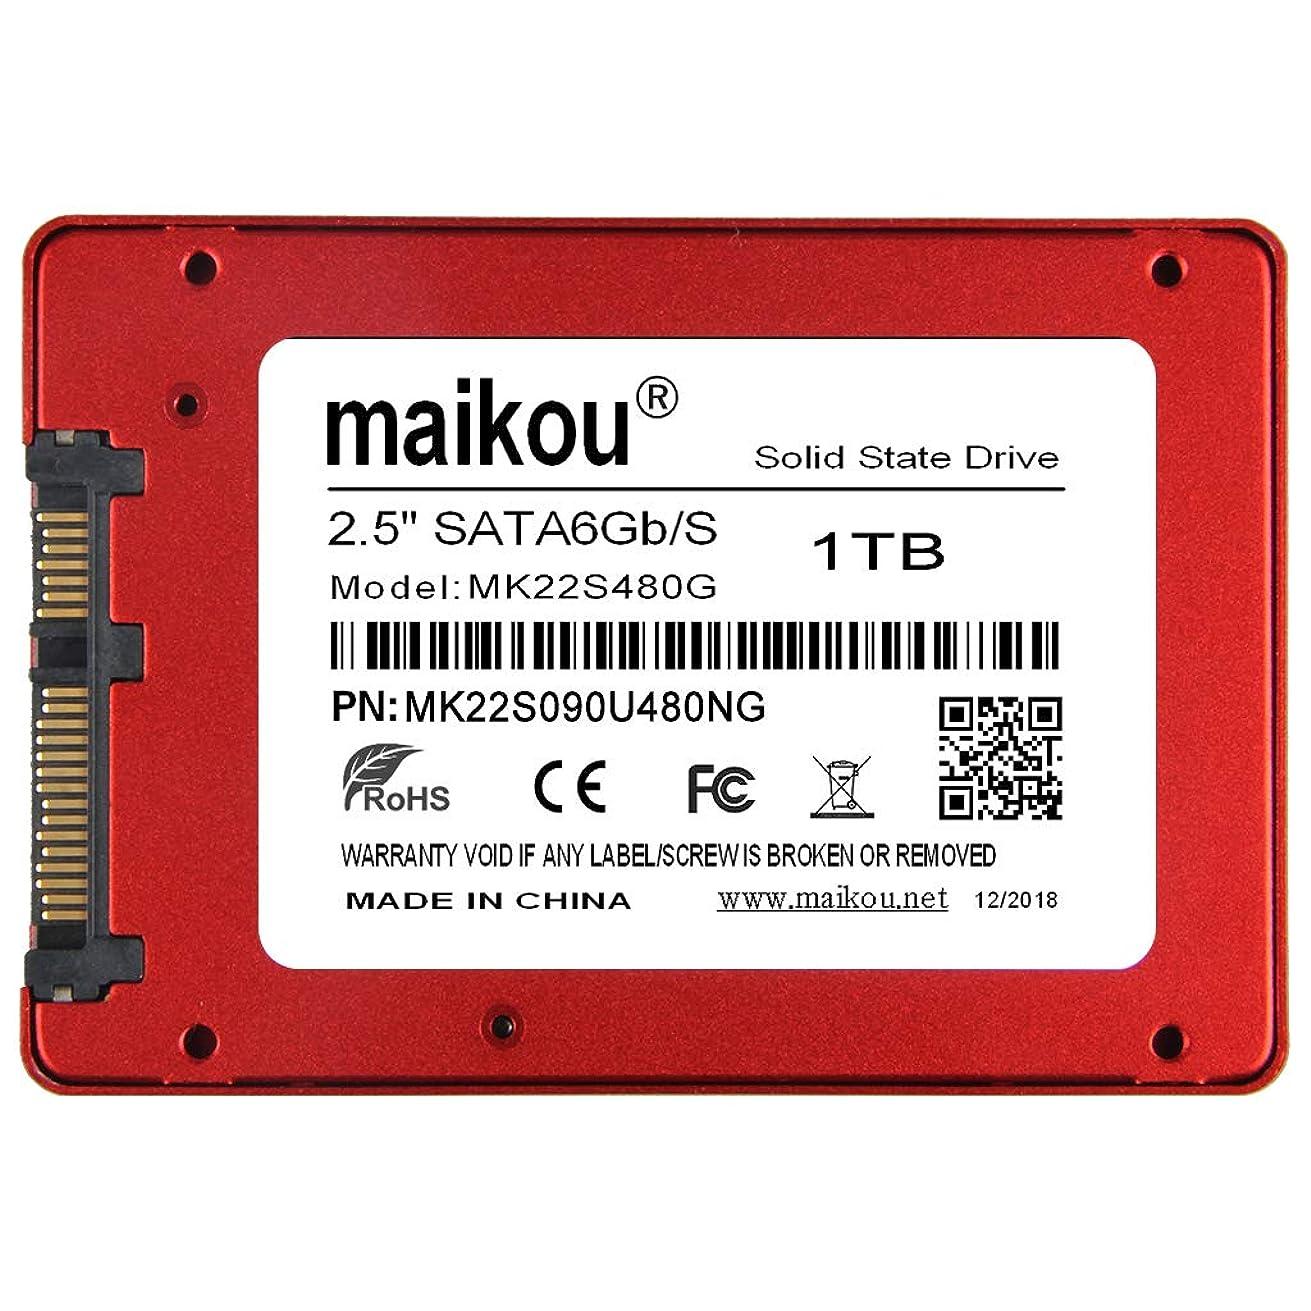 1TB 2.5 SSHD Solid State Hybrid Drive for Dell Vostro 1000 1014 1015 1088 1200 1220 1310 1320 1400